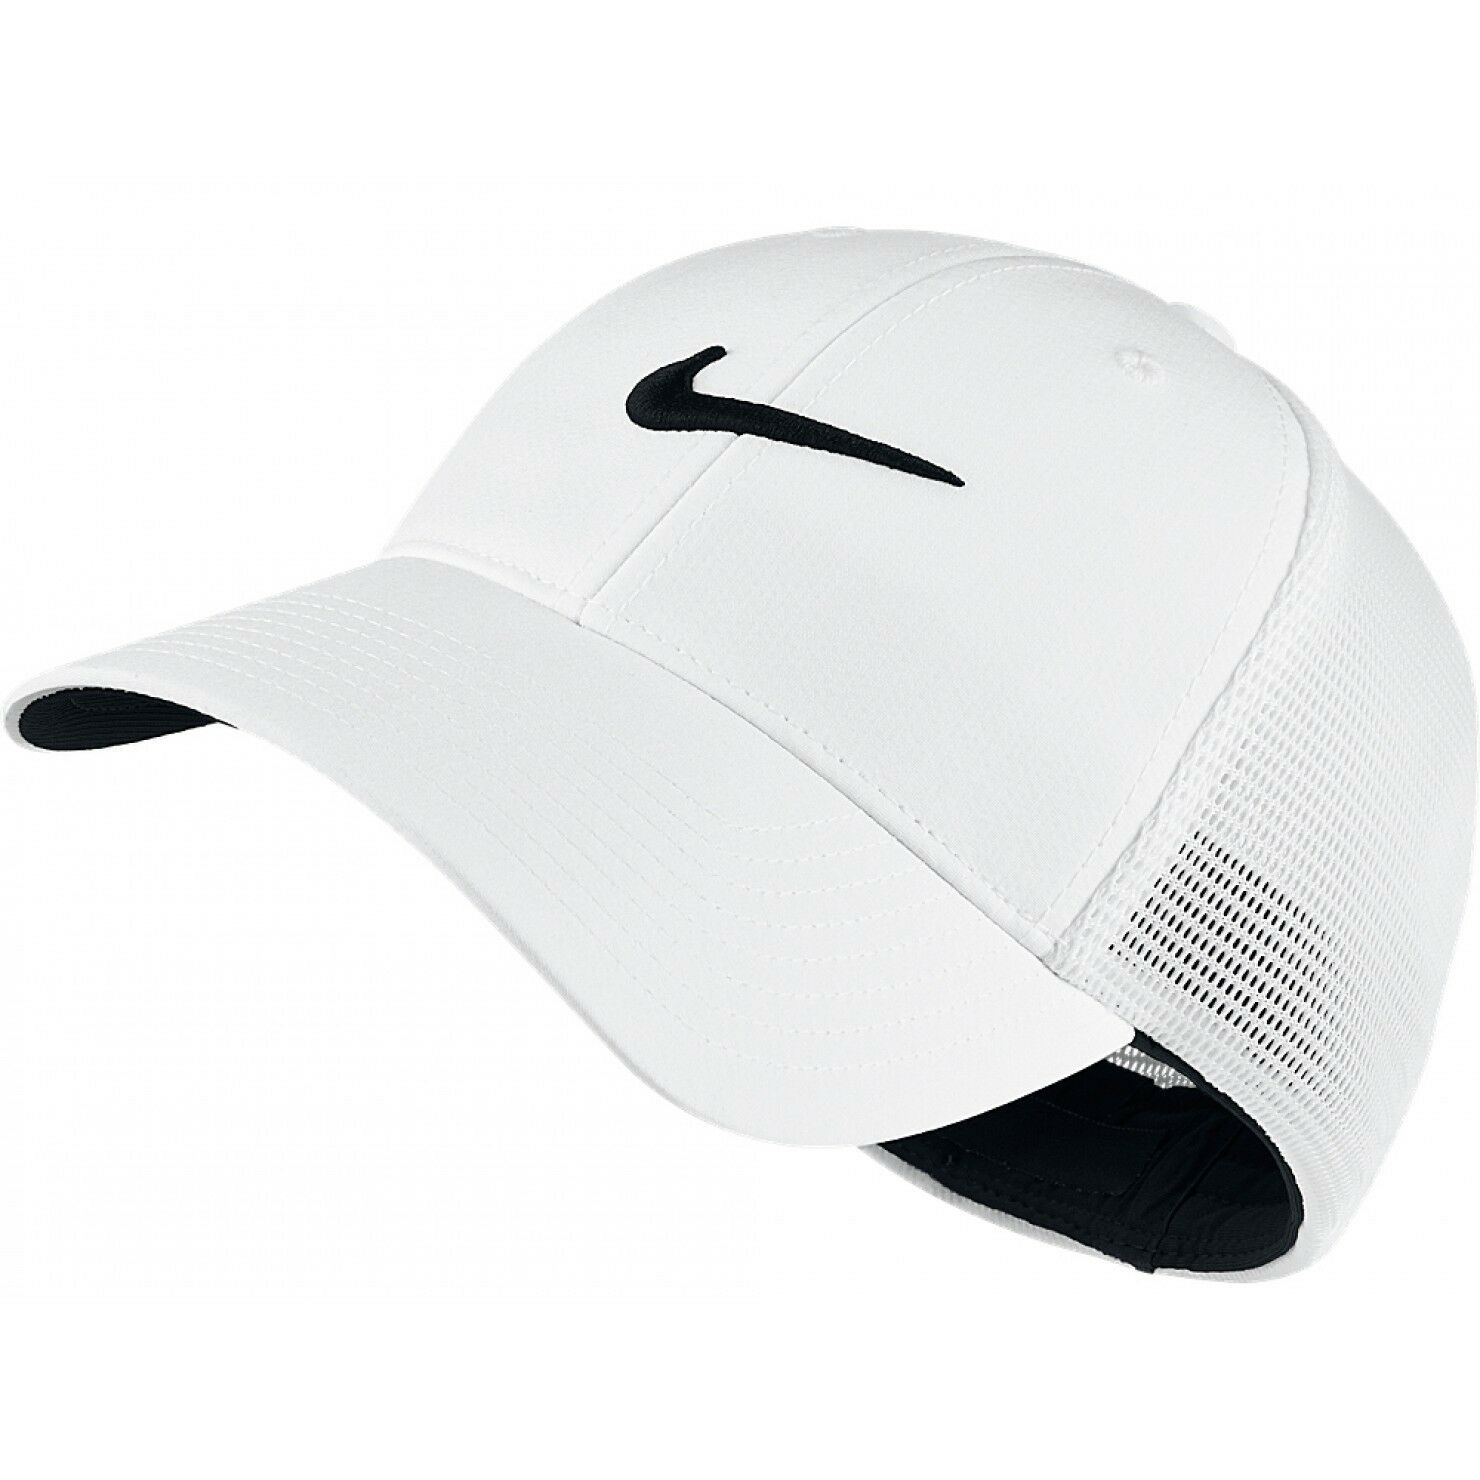 NEW  White [S M]  NIKE Adult Unisex MESH-FLEXFIT Cap Small Medium  100% price guarantee